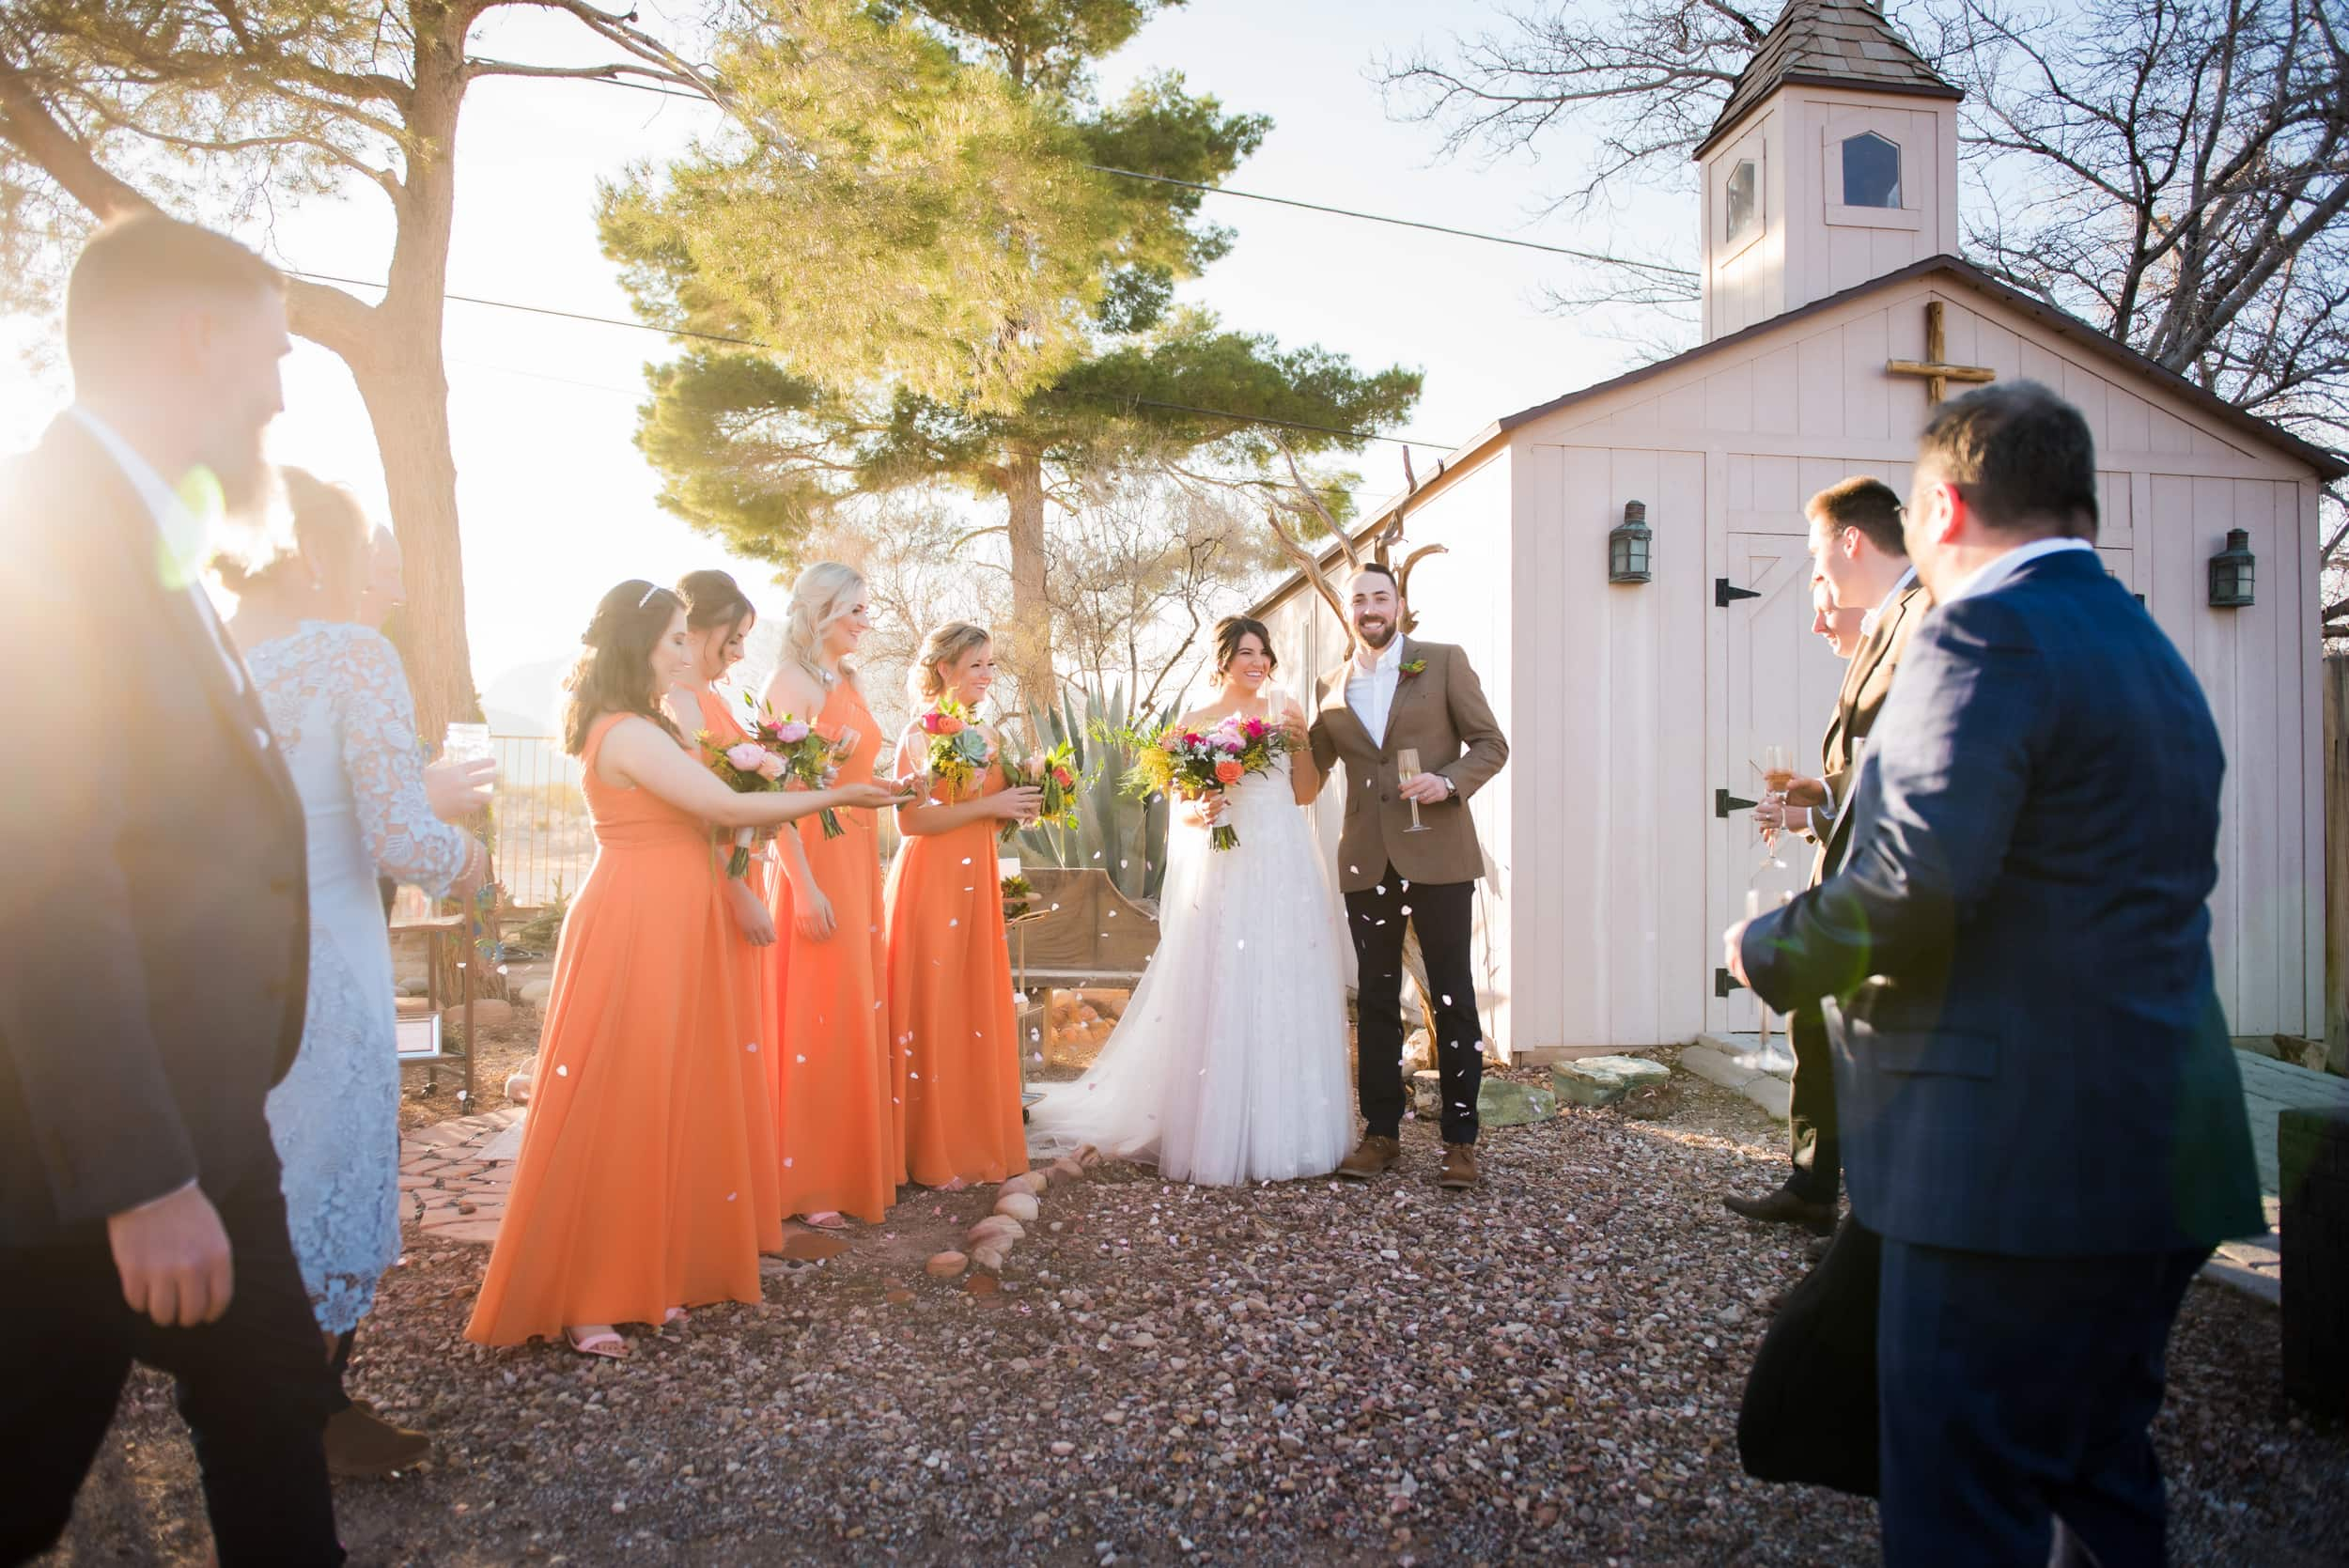 Bridal party in bright orange bridemaid dresses.